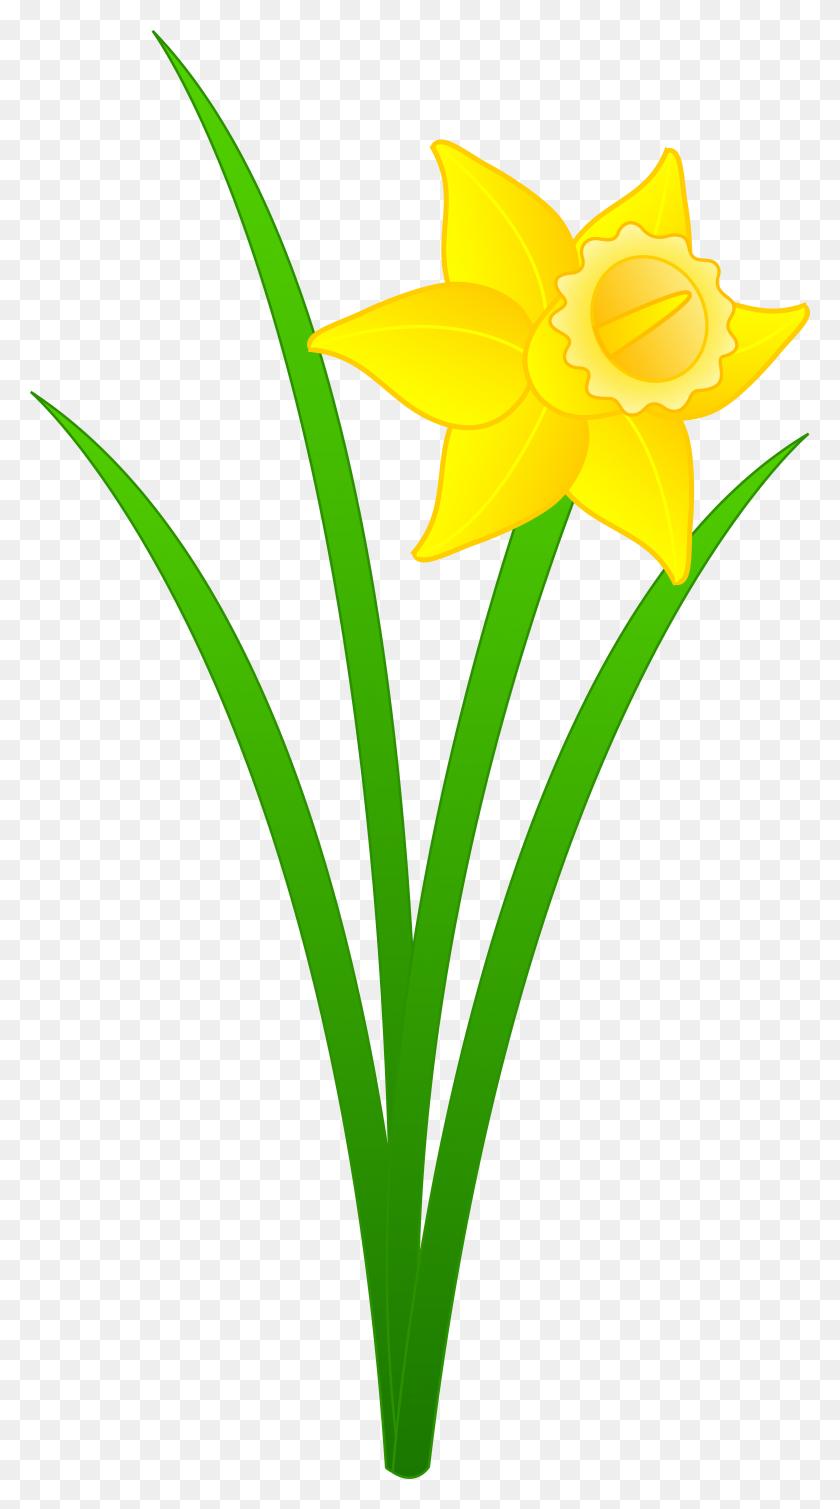 Single Golden Daffodil - Single Flower Clipart